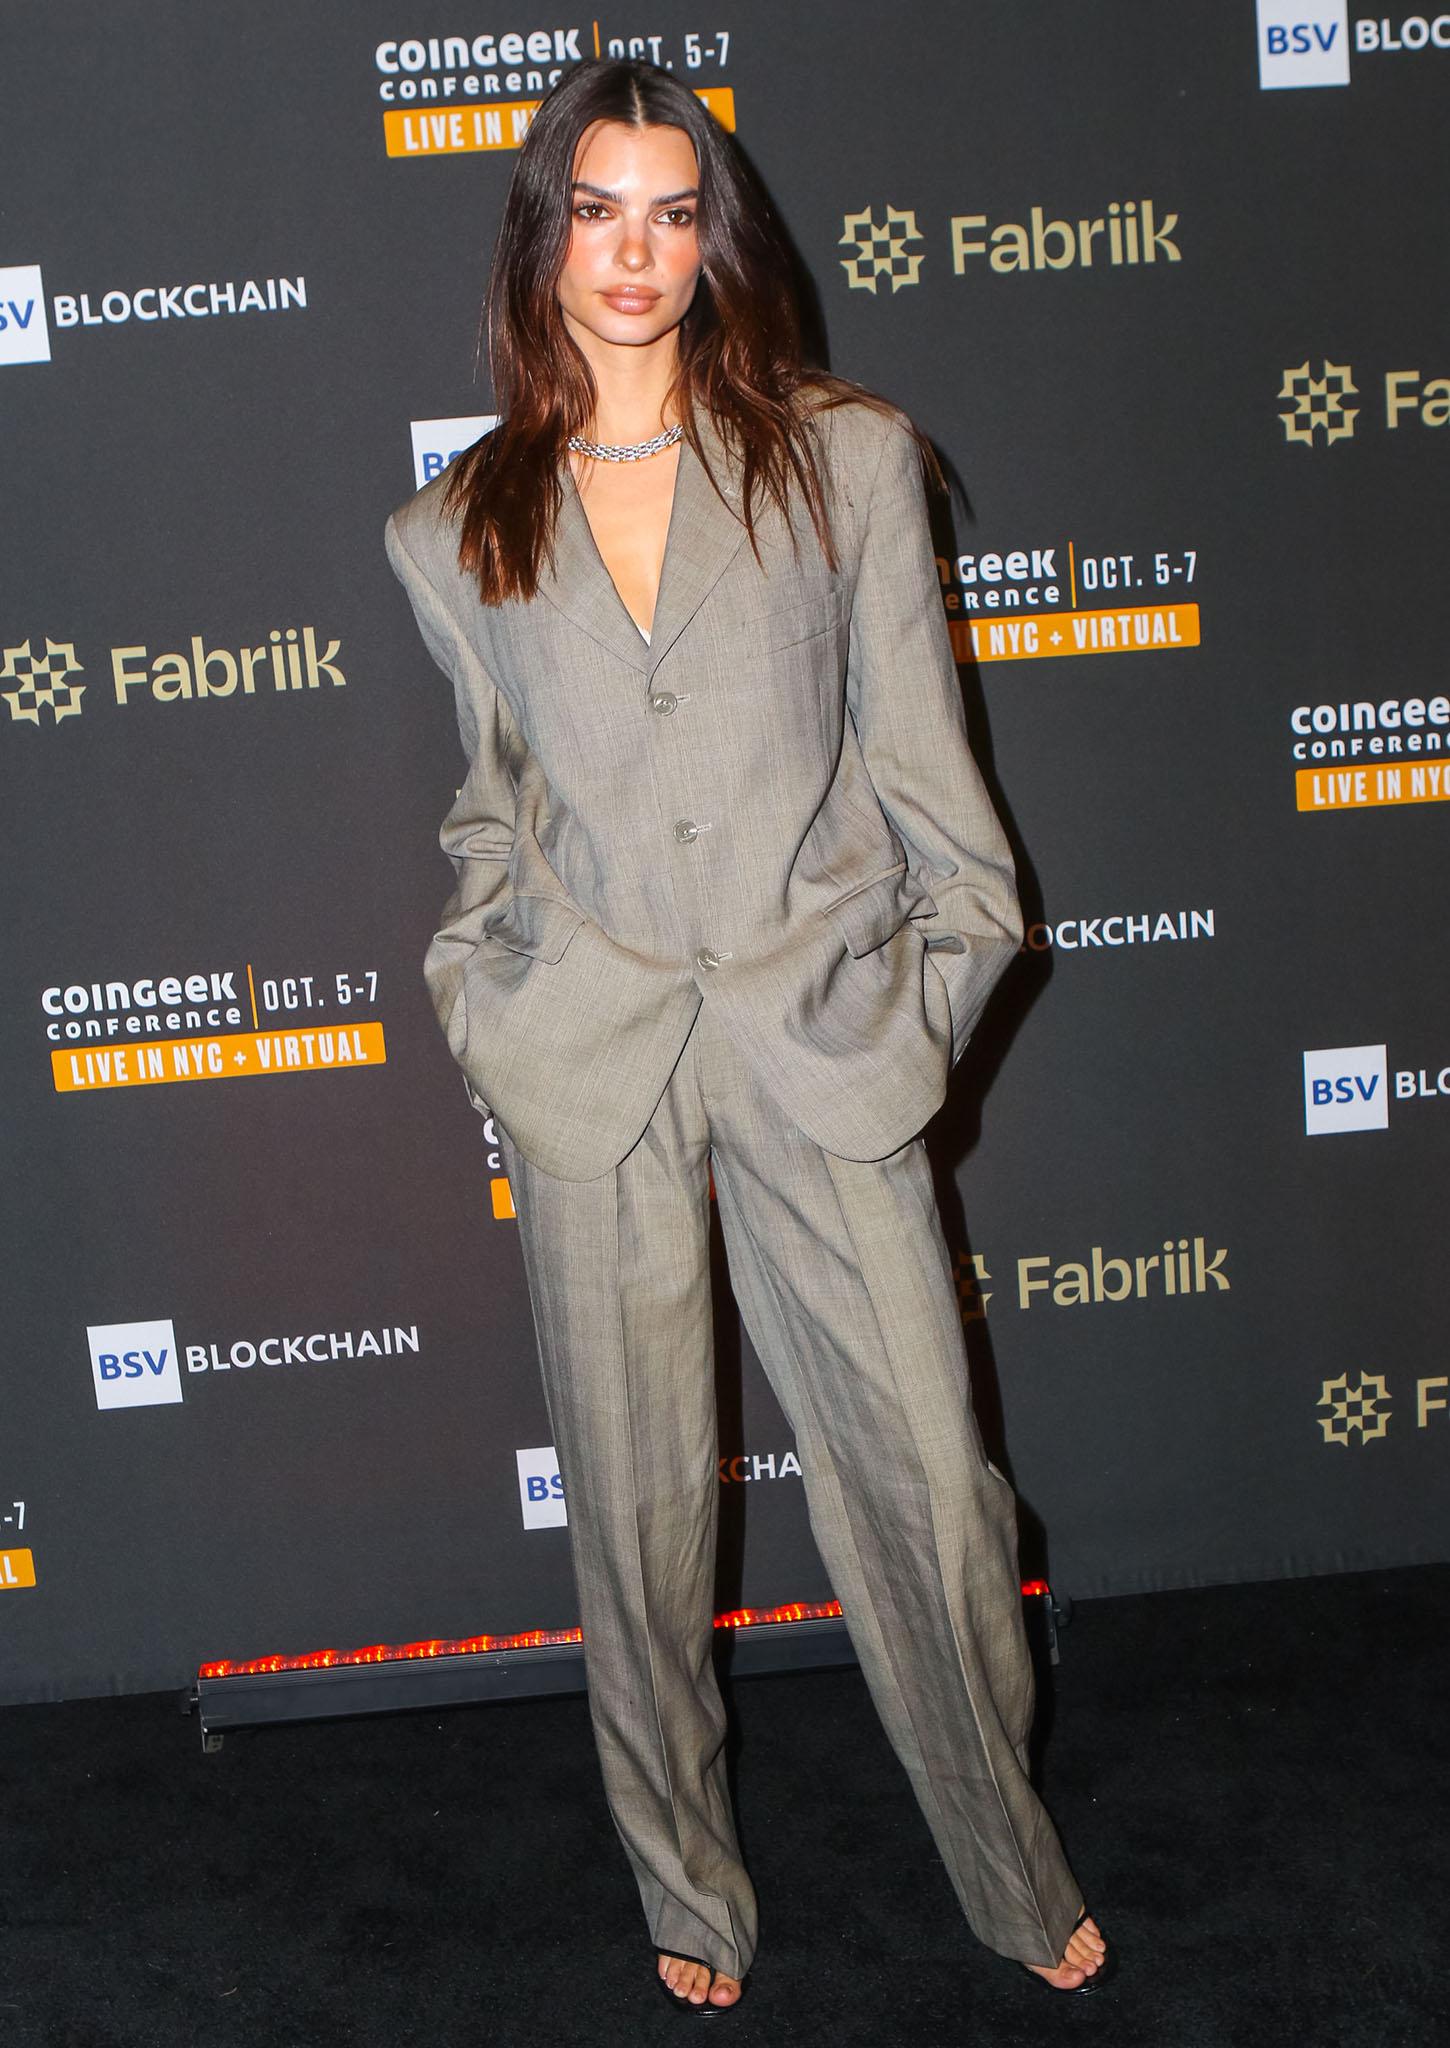 Emily Ratajkowski looks chic in a menswear-inspired Ralph Lauren Havre Studio gray suit